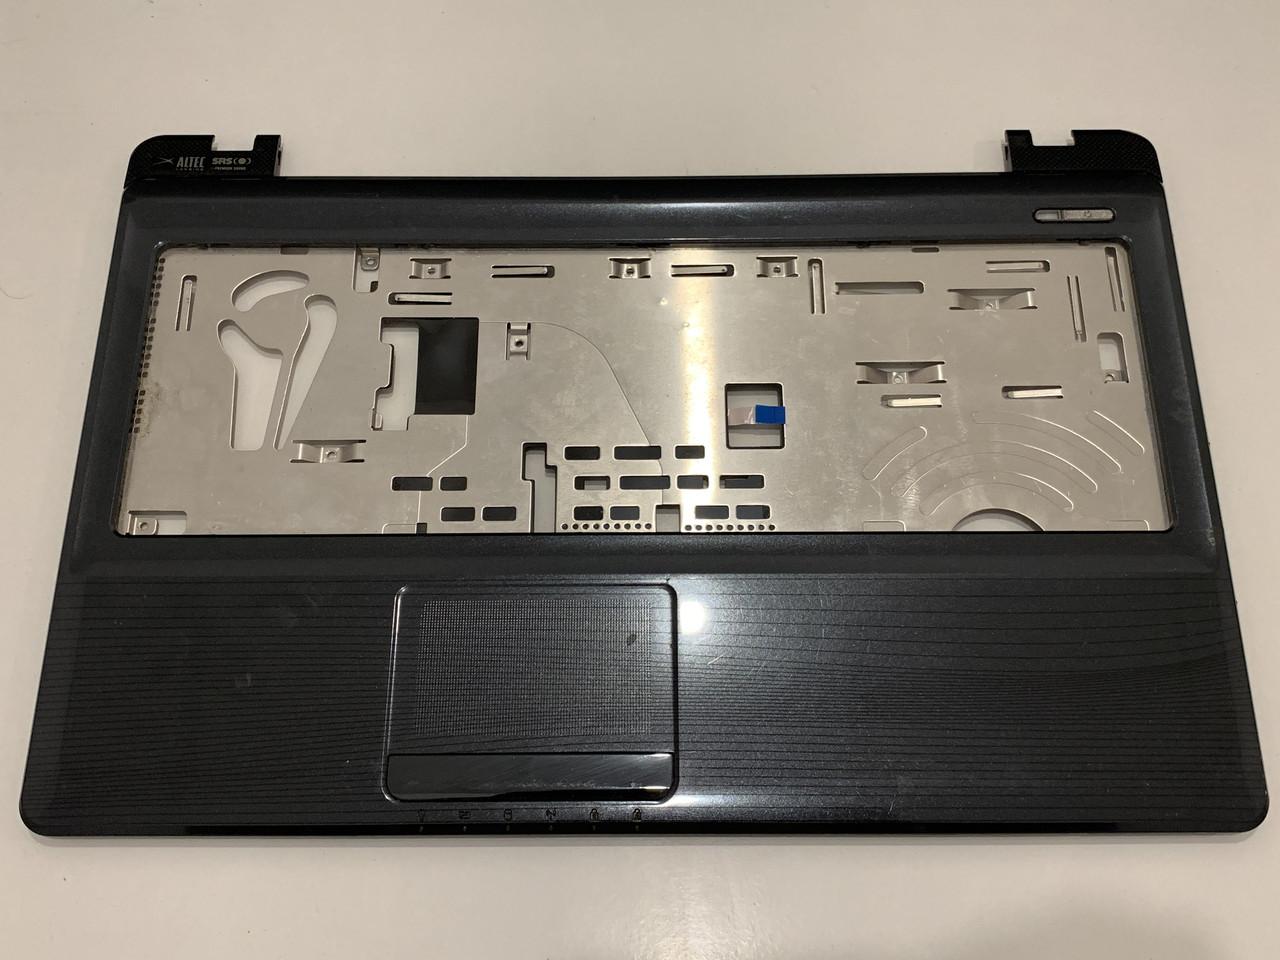 Запчасти для ноутбука Asus K52D - Топкейс, тачпад PN: 13GNXm30p032-2-2